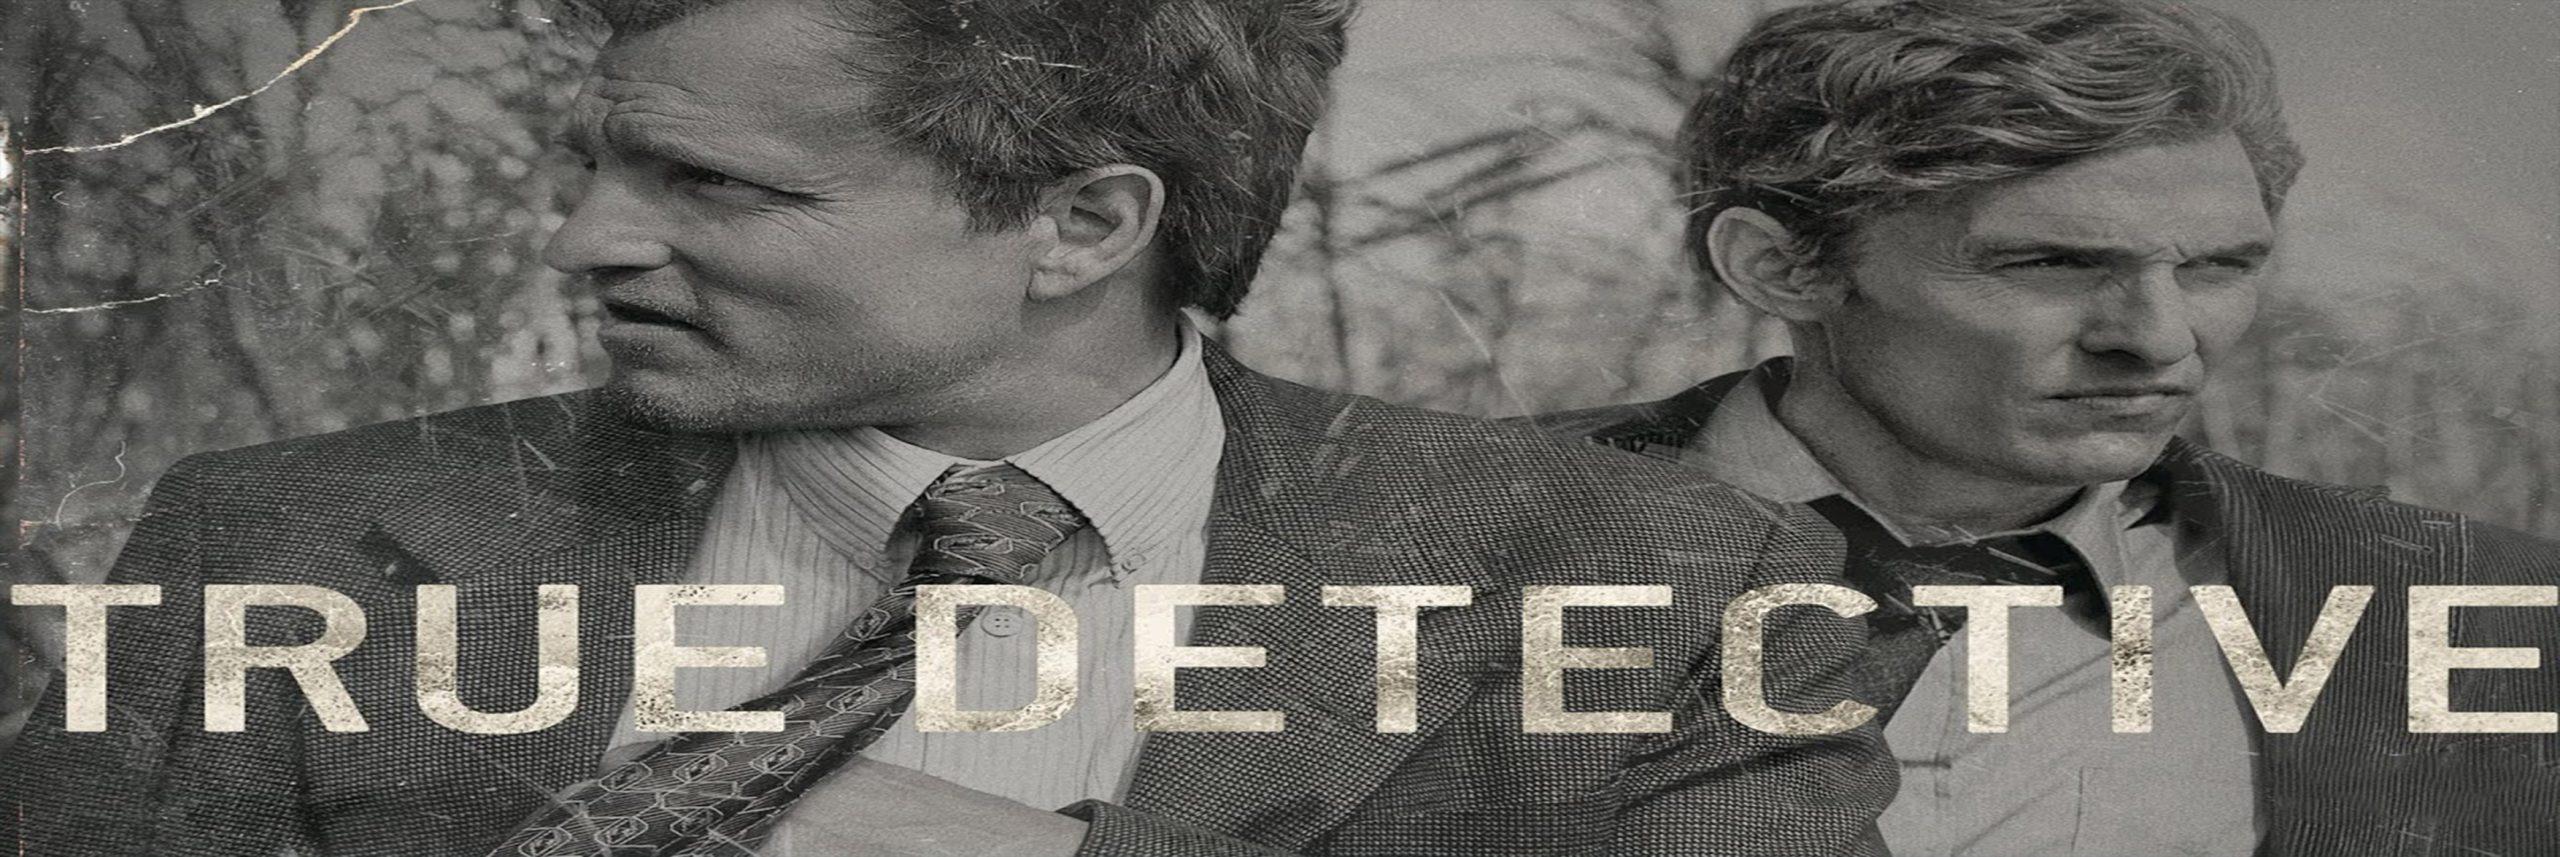 کارآگاه حقیقی – True Detective